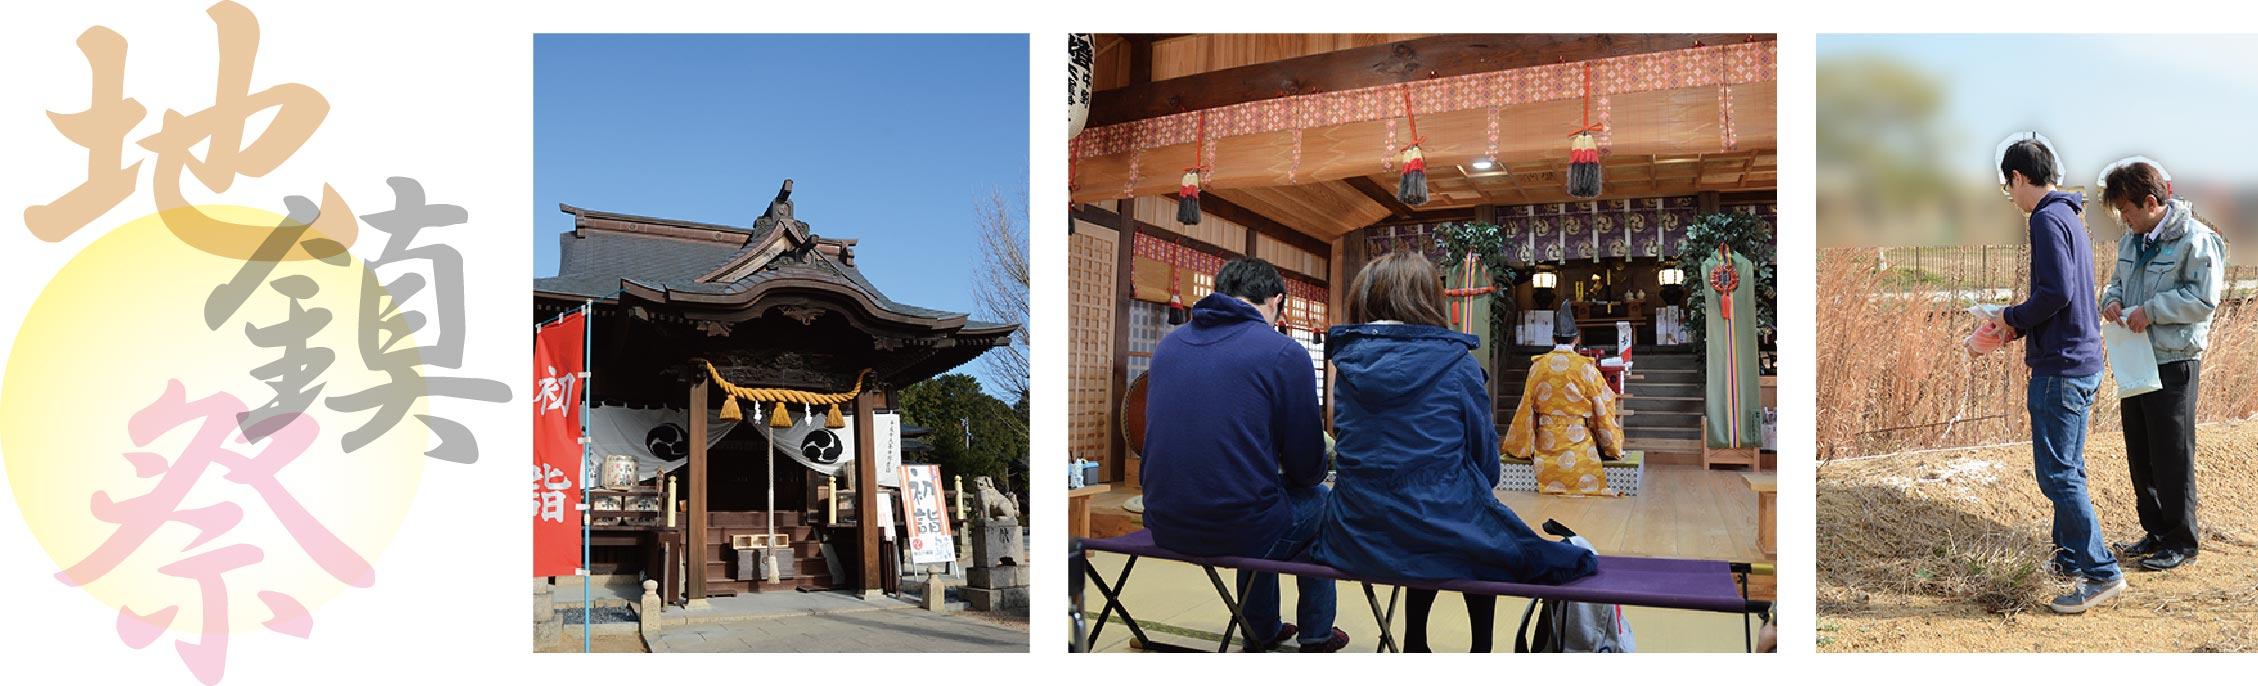 KuraSi-natu-sin93-04.jpg